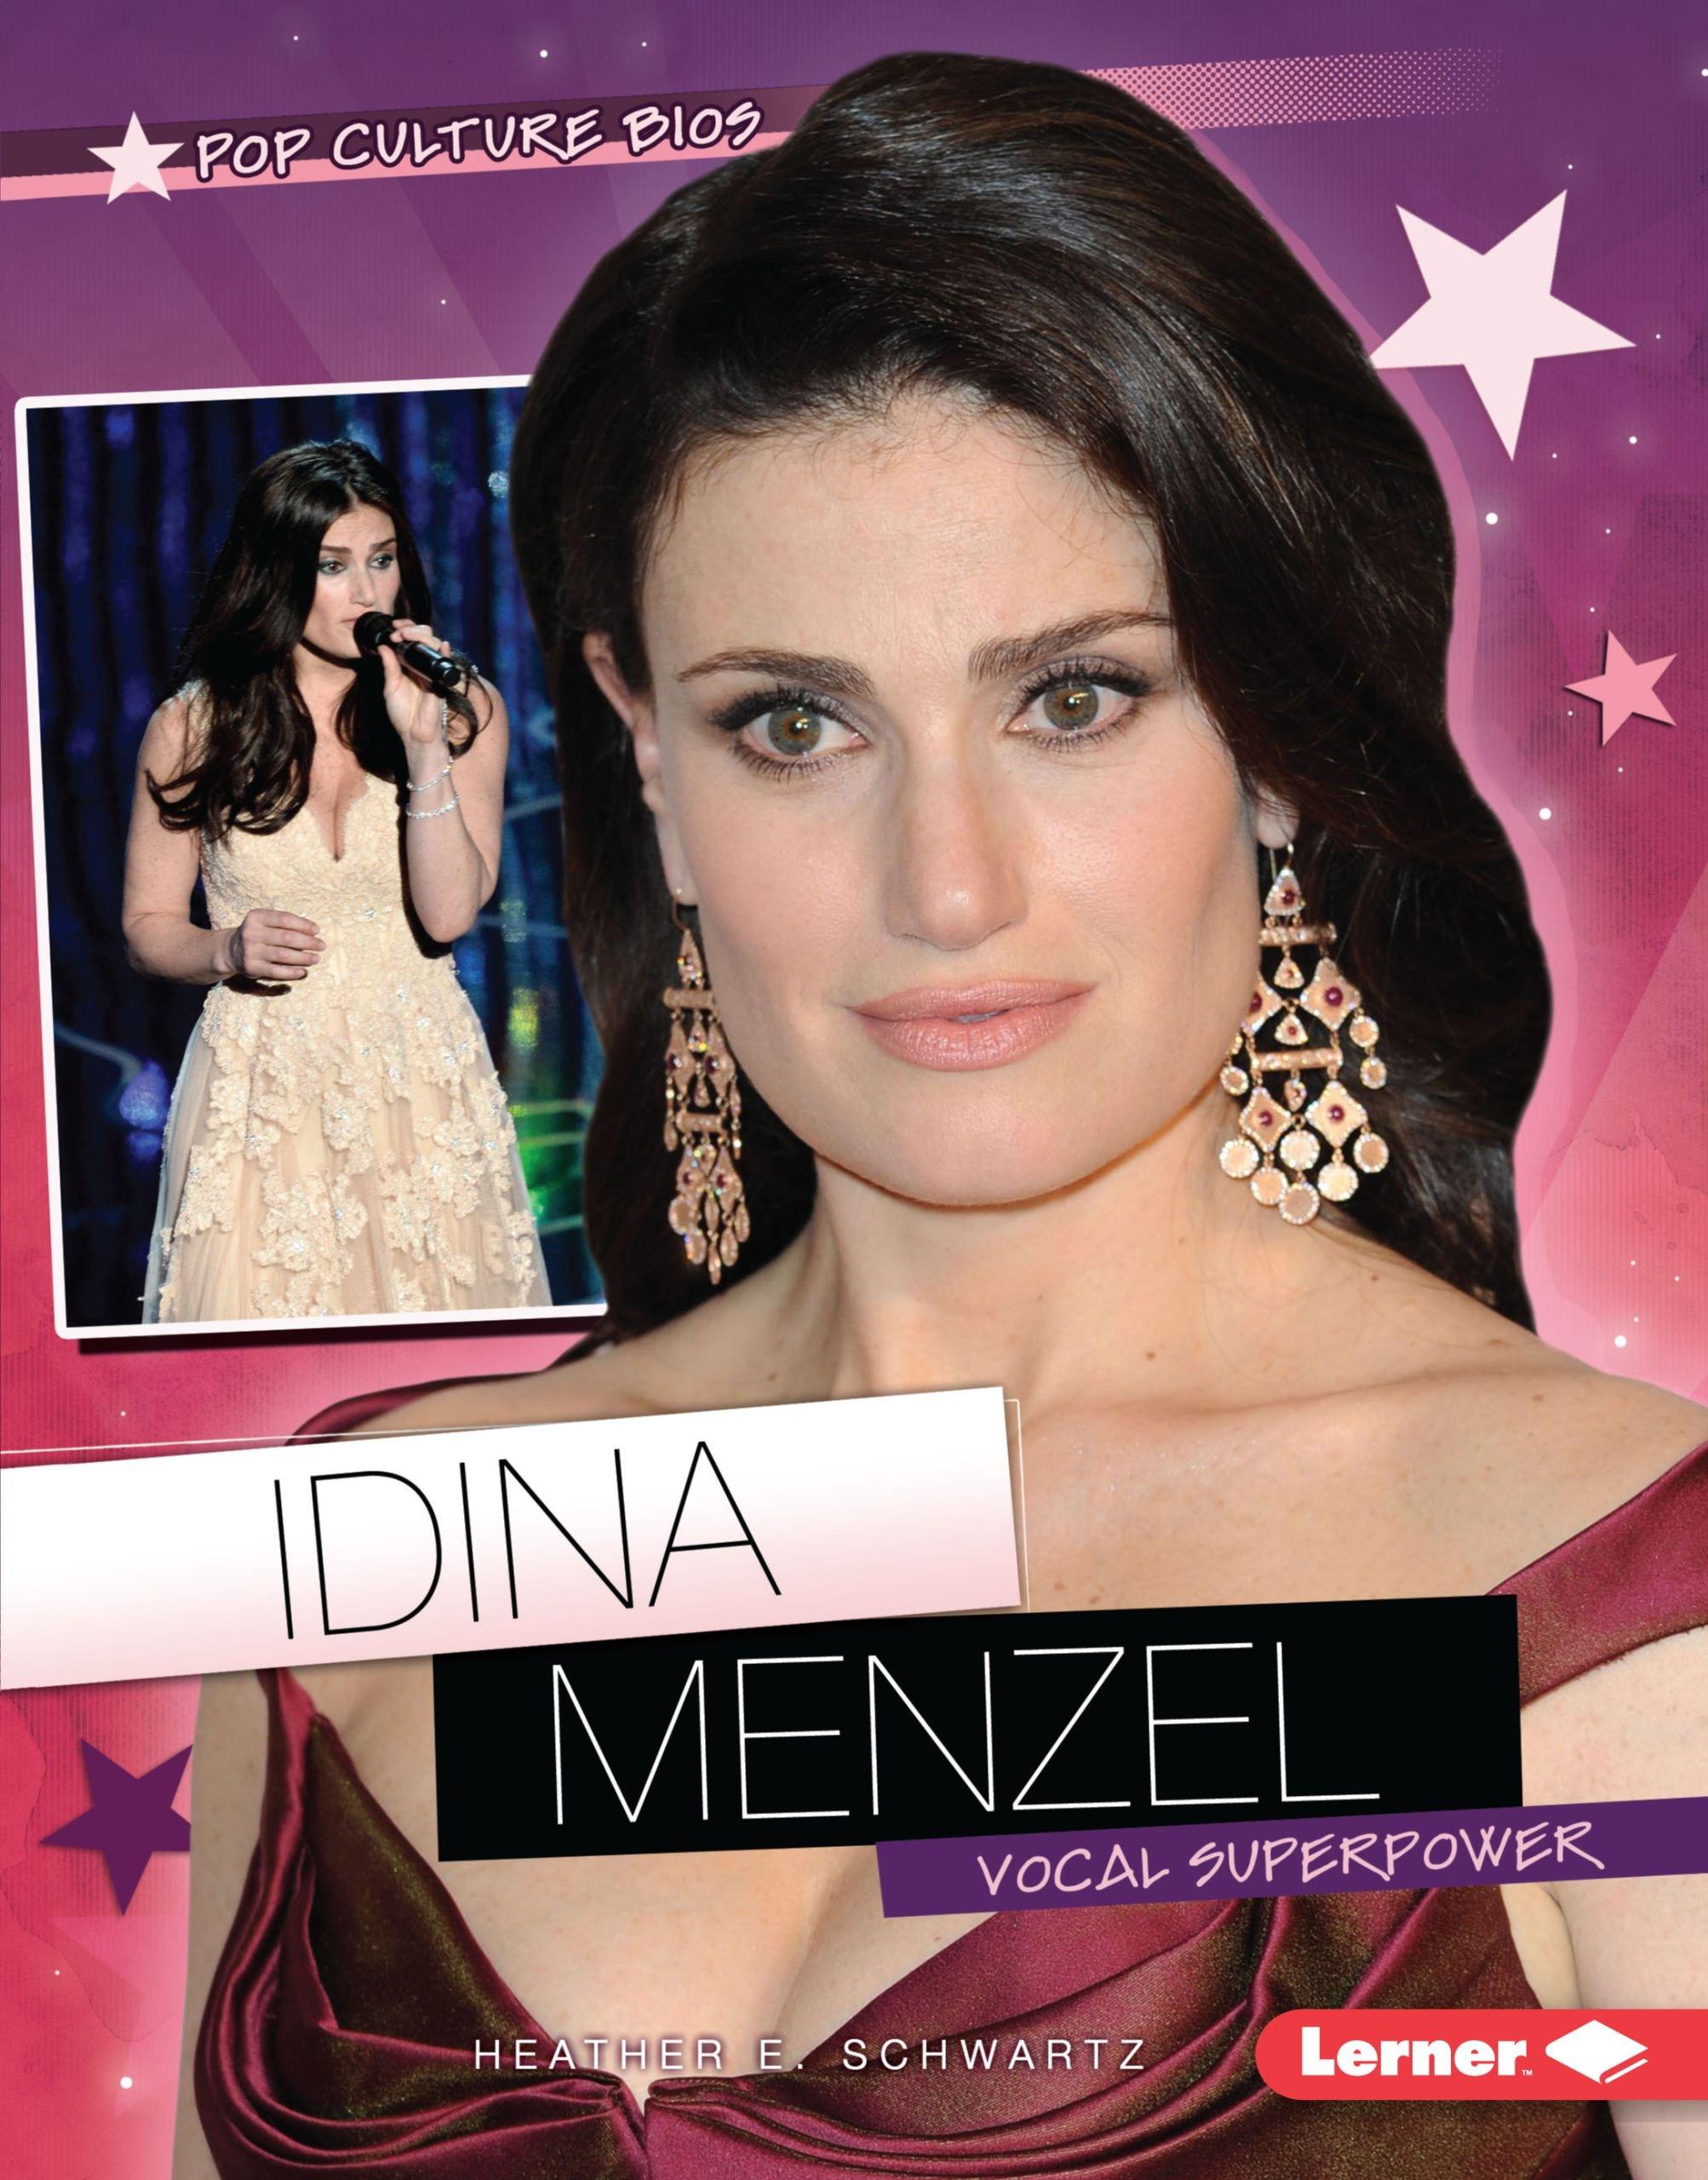 Idina Menzel: Vocal Superpower (Pop Culture Bios)